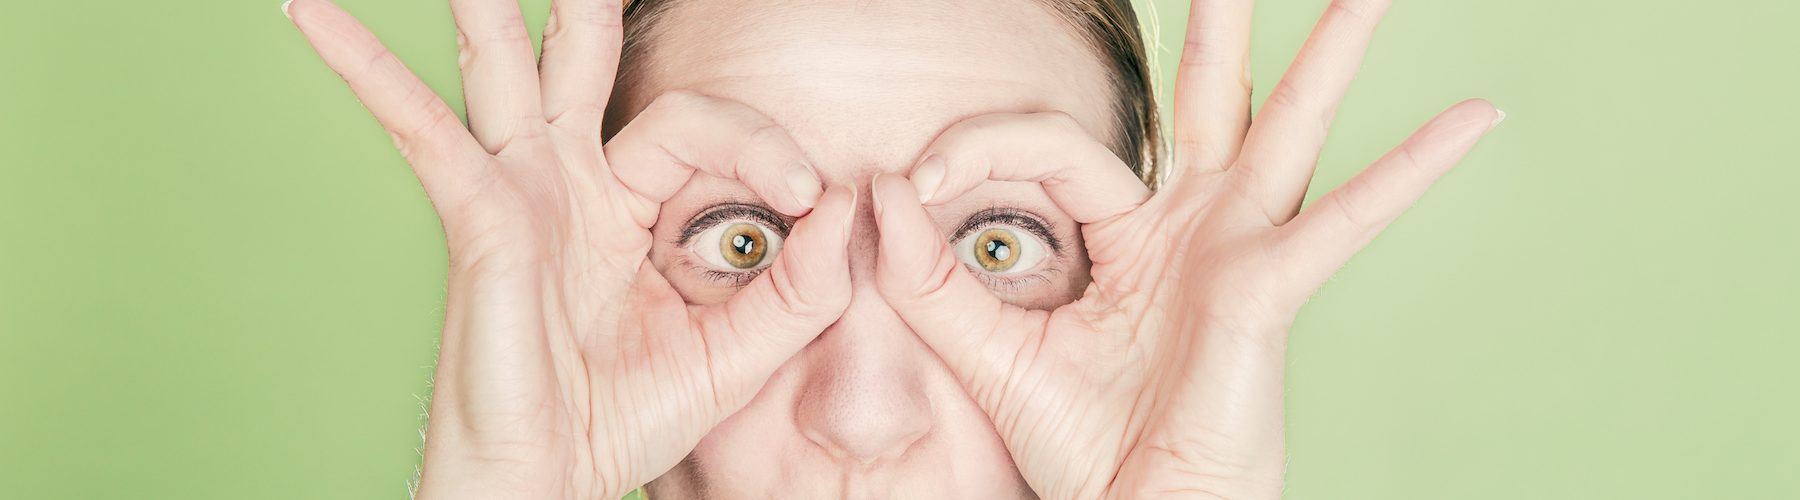 Dark Eye Circles: How to Get Rid of Them Eye Bags